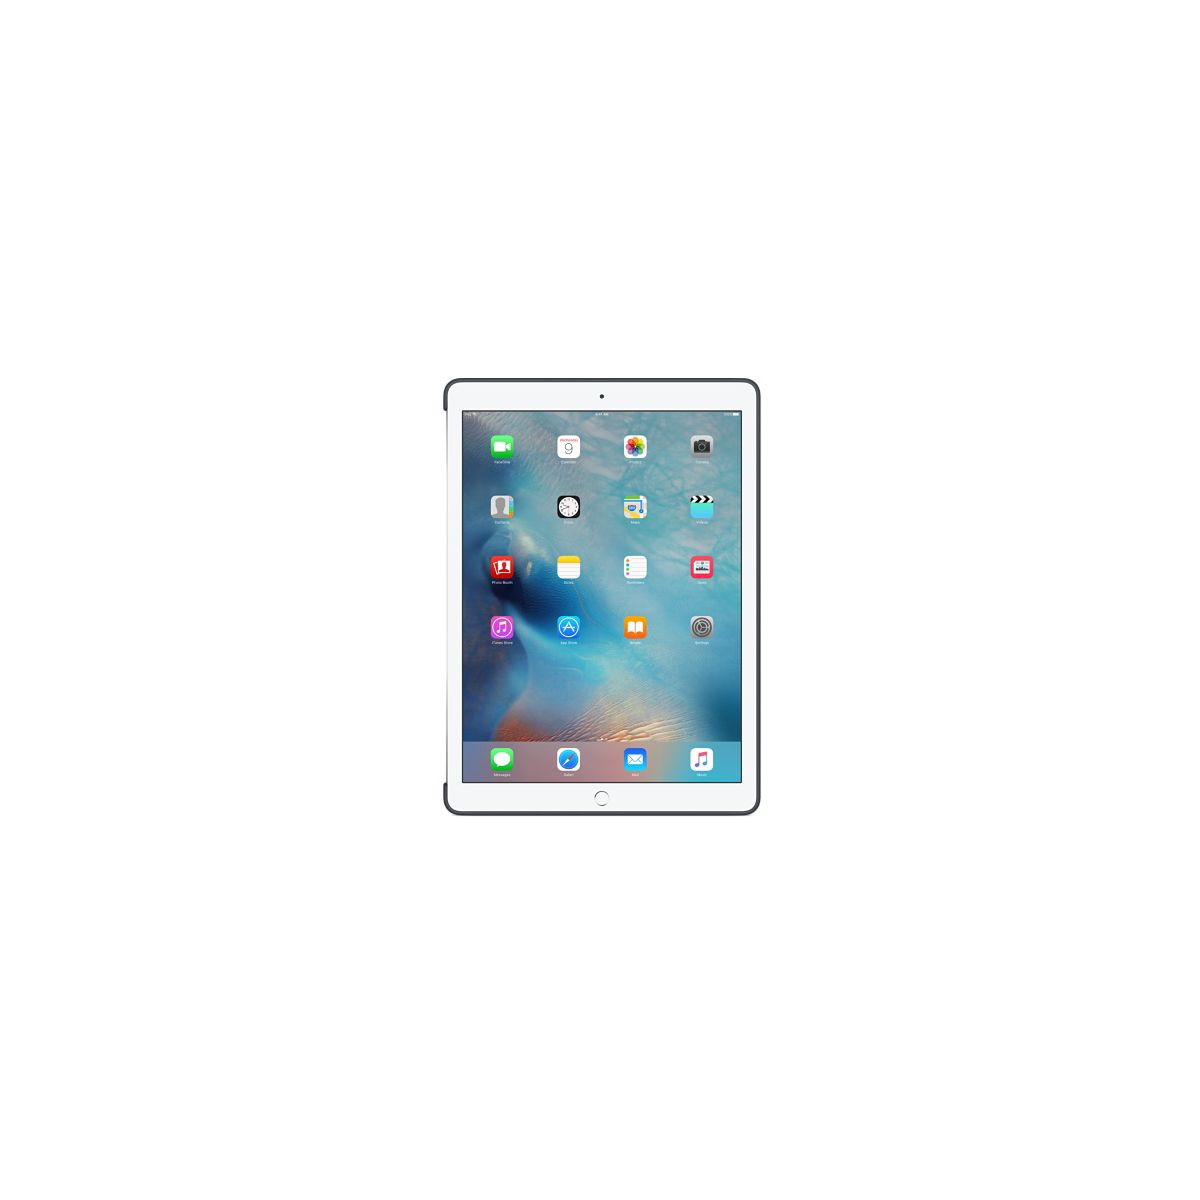 Coque apple ipad pro silicone gris anthracite (photo)